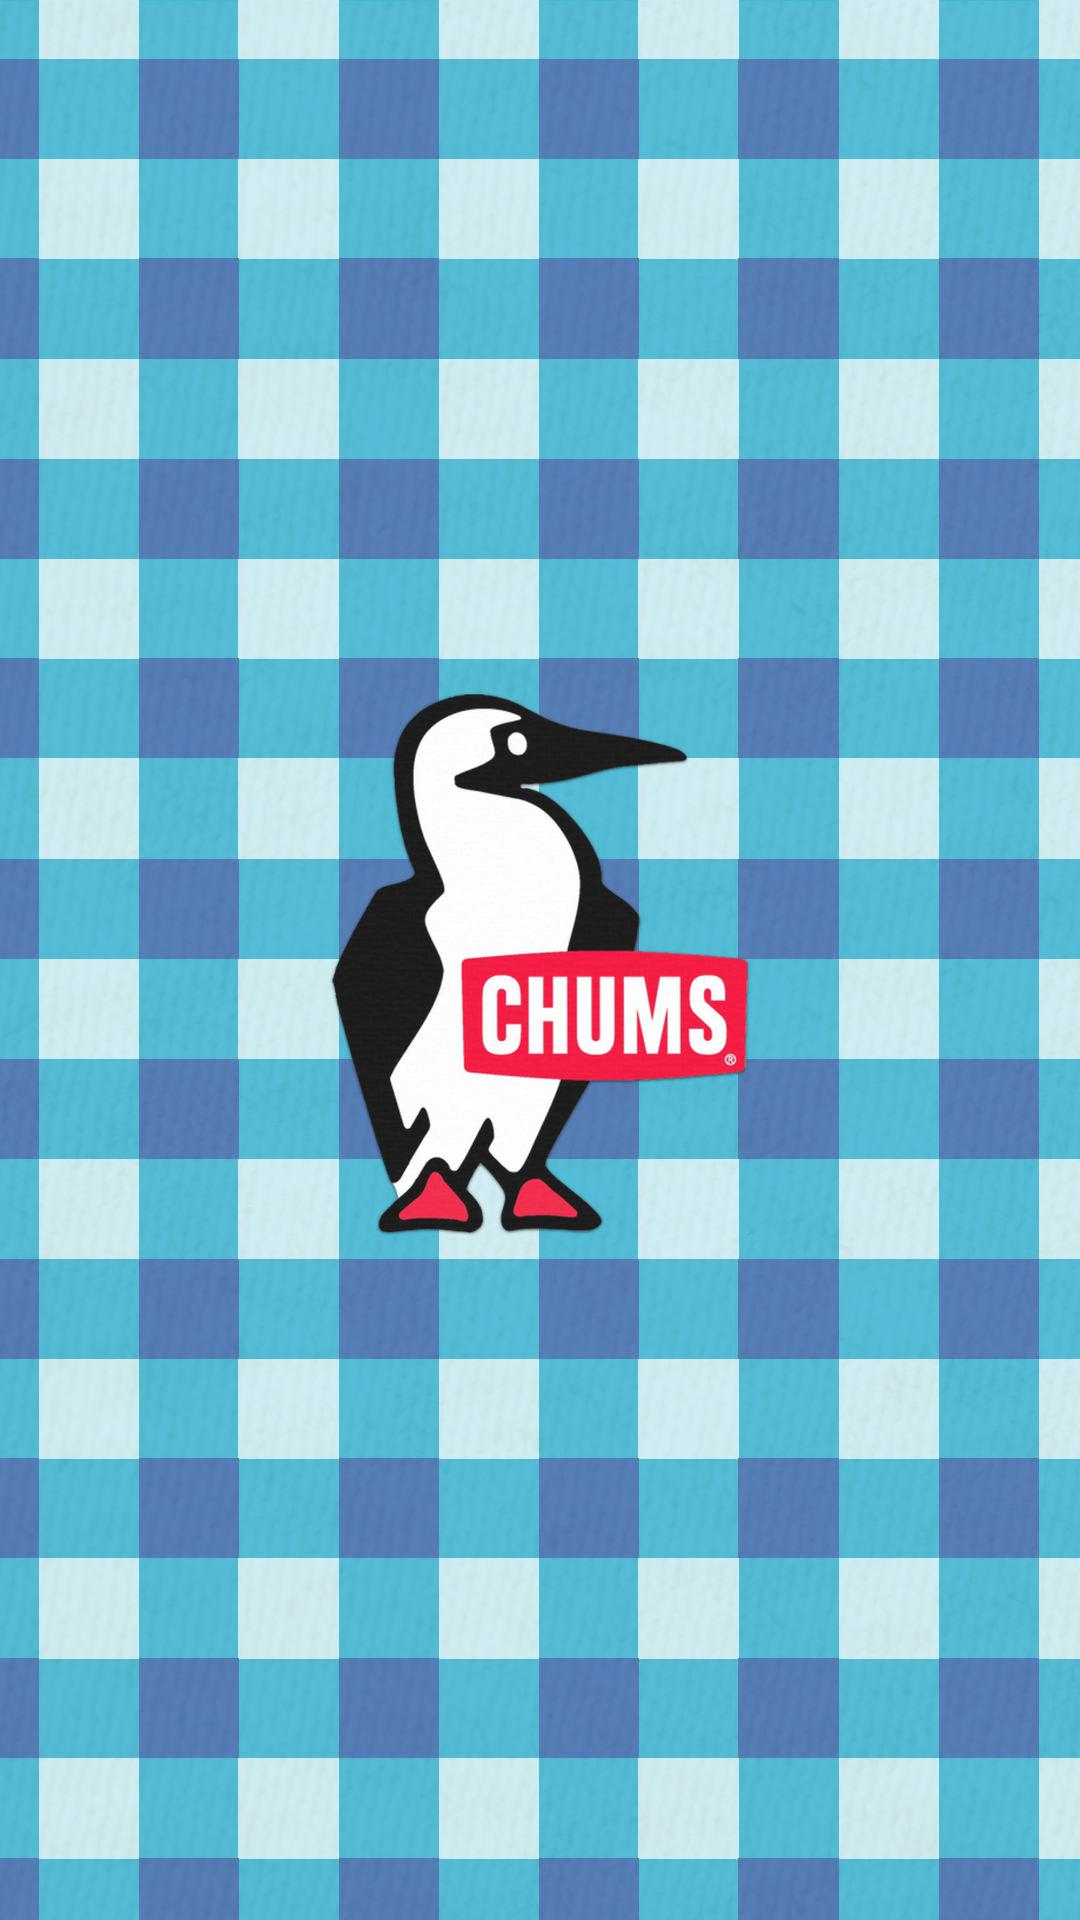 chums26 - CHUMS[チャムス]の高画質スマホ壁紙50枚 [iPhone&Androidに対応]